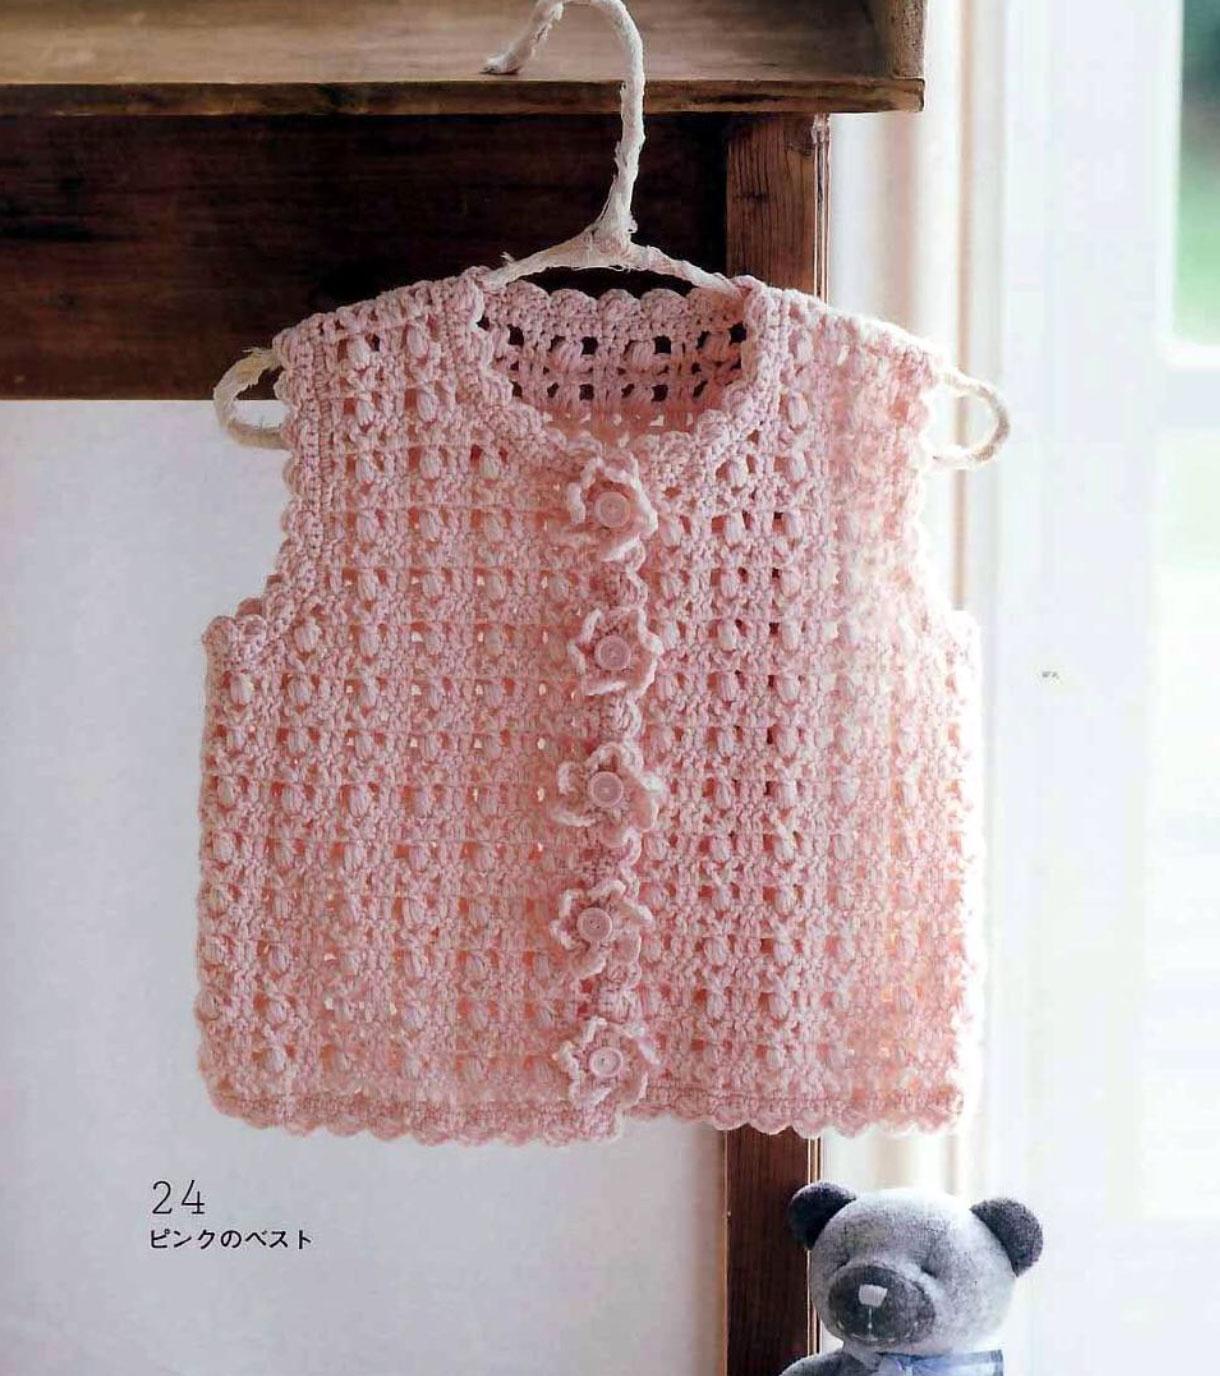 Crochet Vest 12-24 Months ⋆ Crochet Kingdom